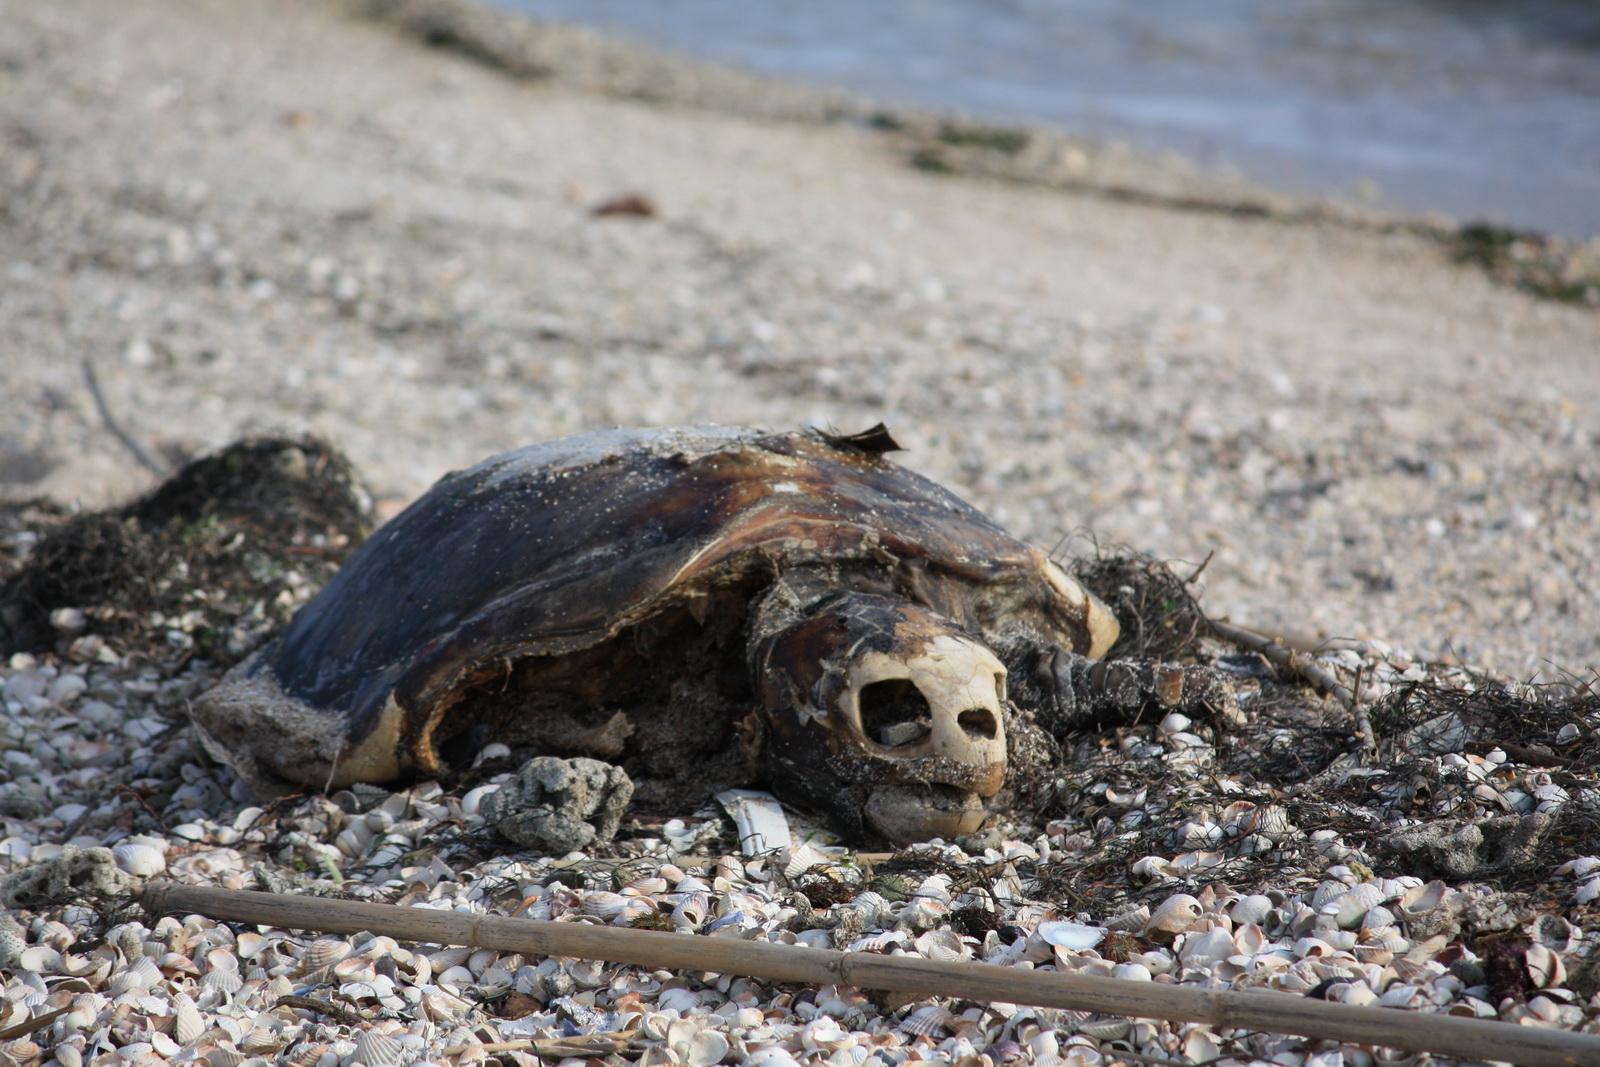 IMG_7468 Νεκρή χελώνα_resize